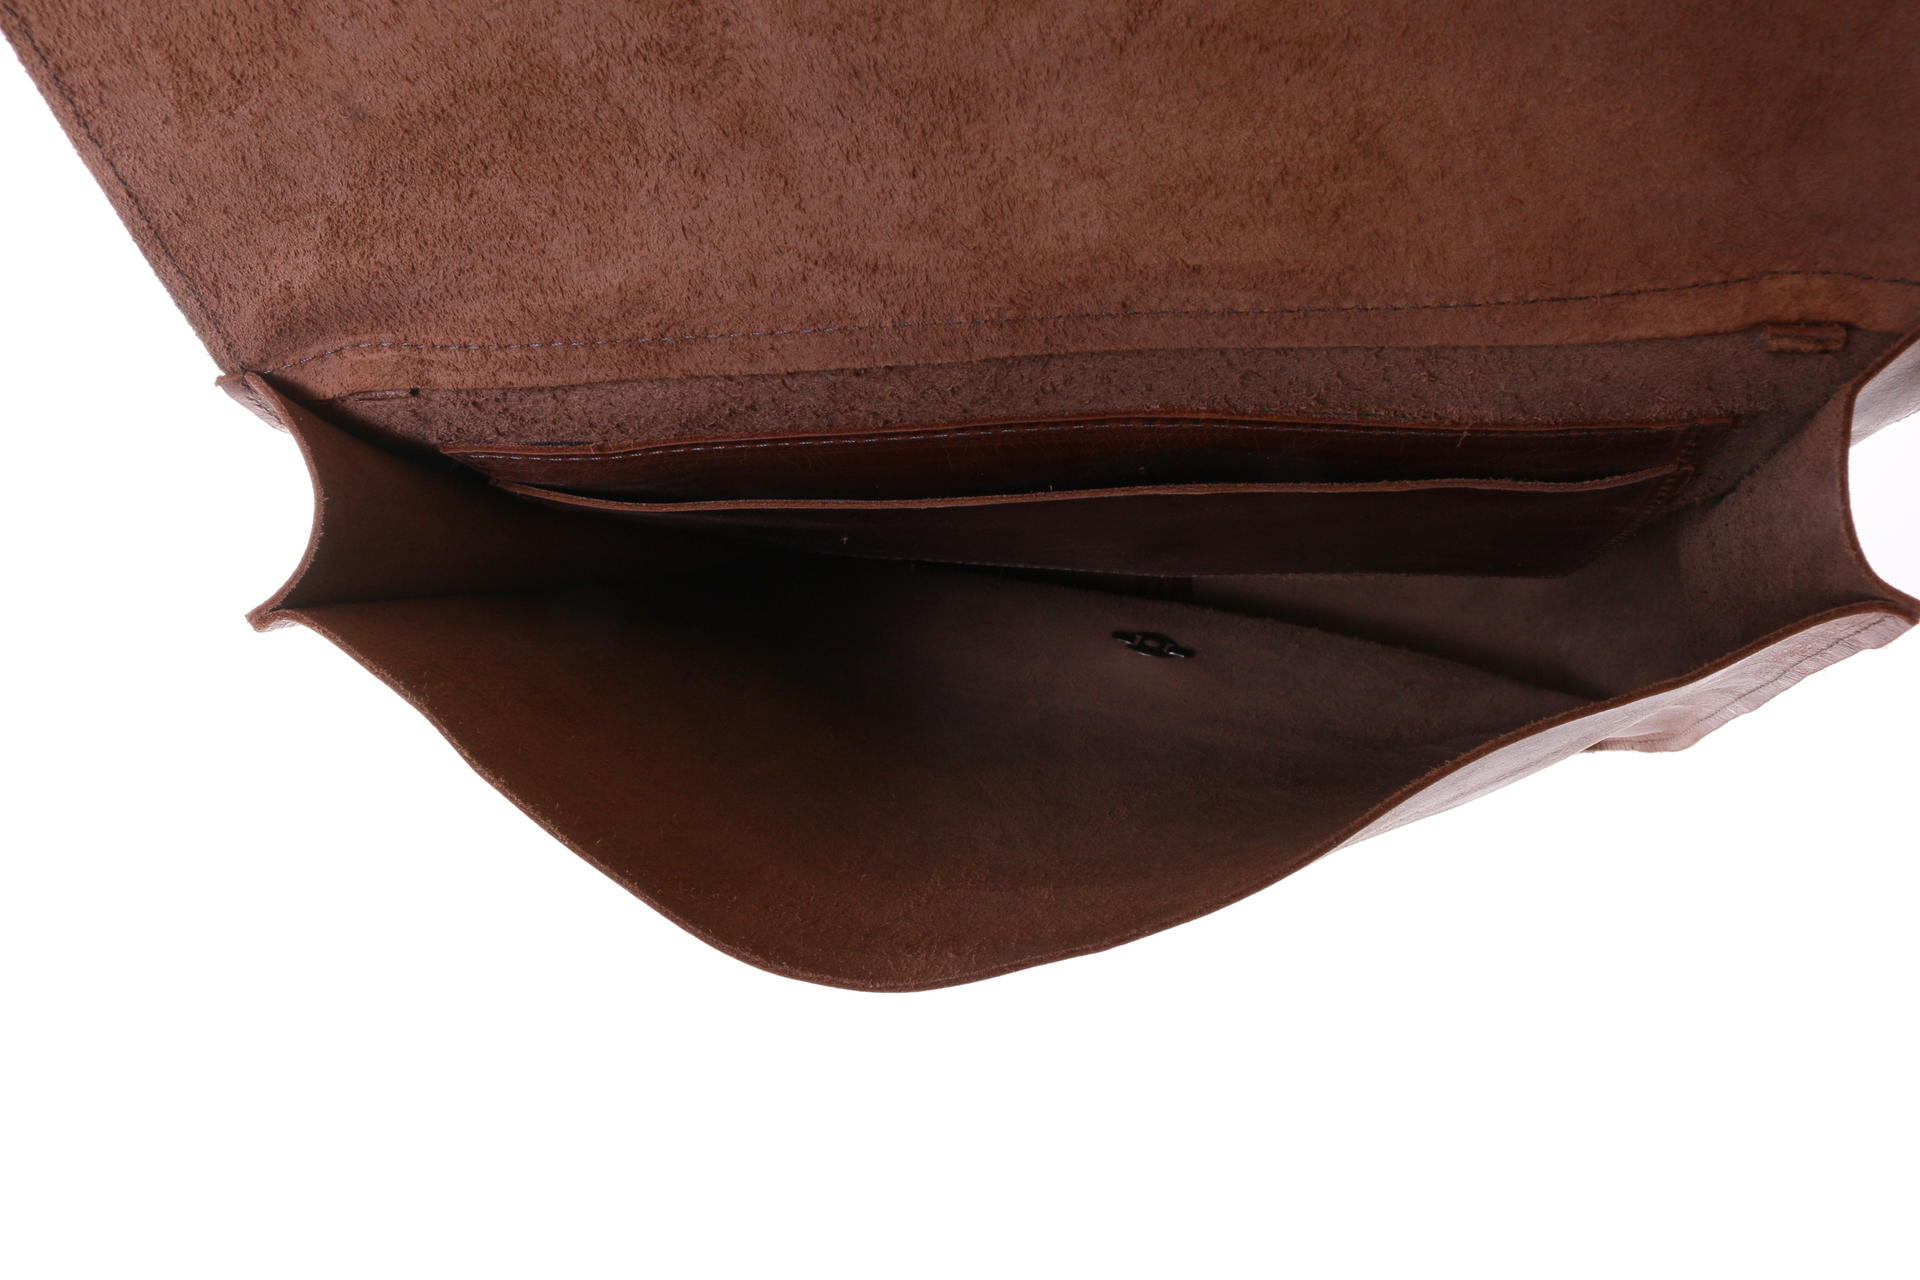 Gundara - fairtrade cow leather bag - handmade in Ethiopia - reversible into a backpack